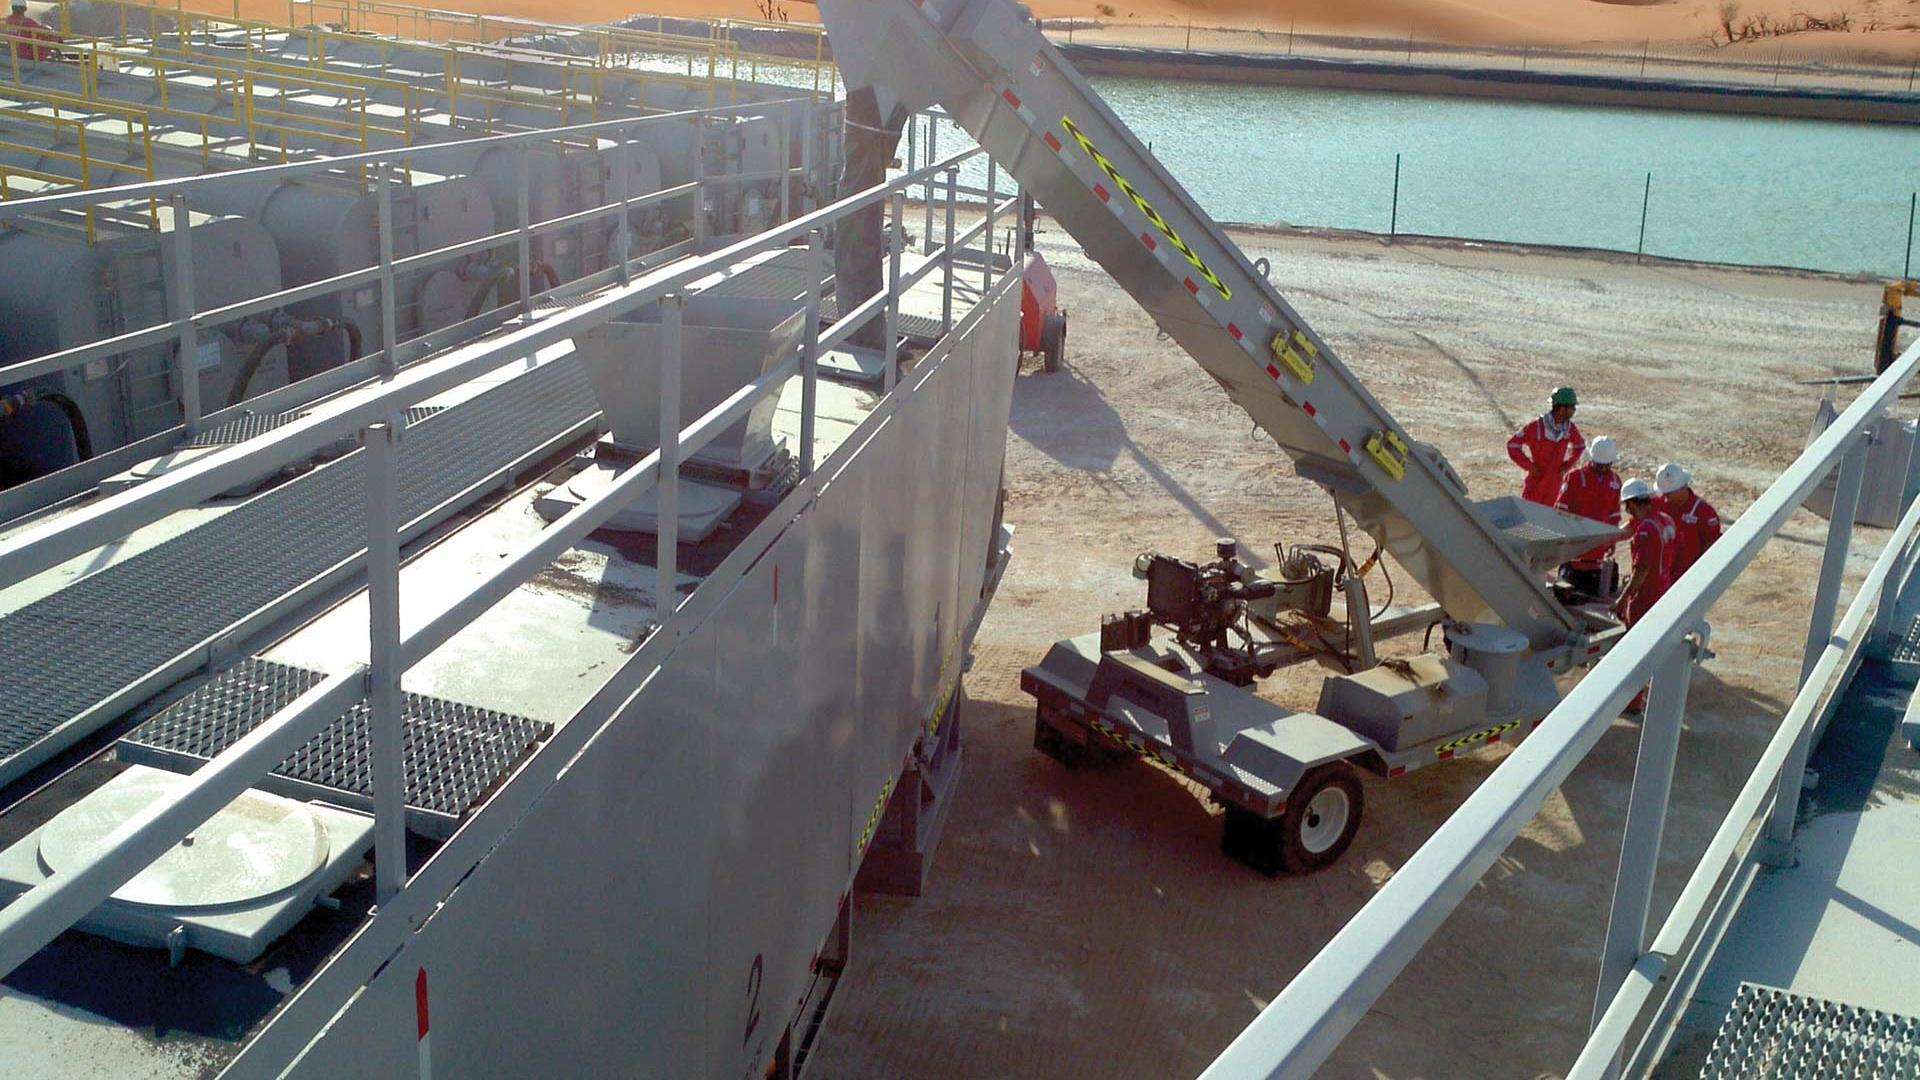 Mobile Unloading Belt Conveyor in use in dese